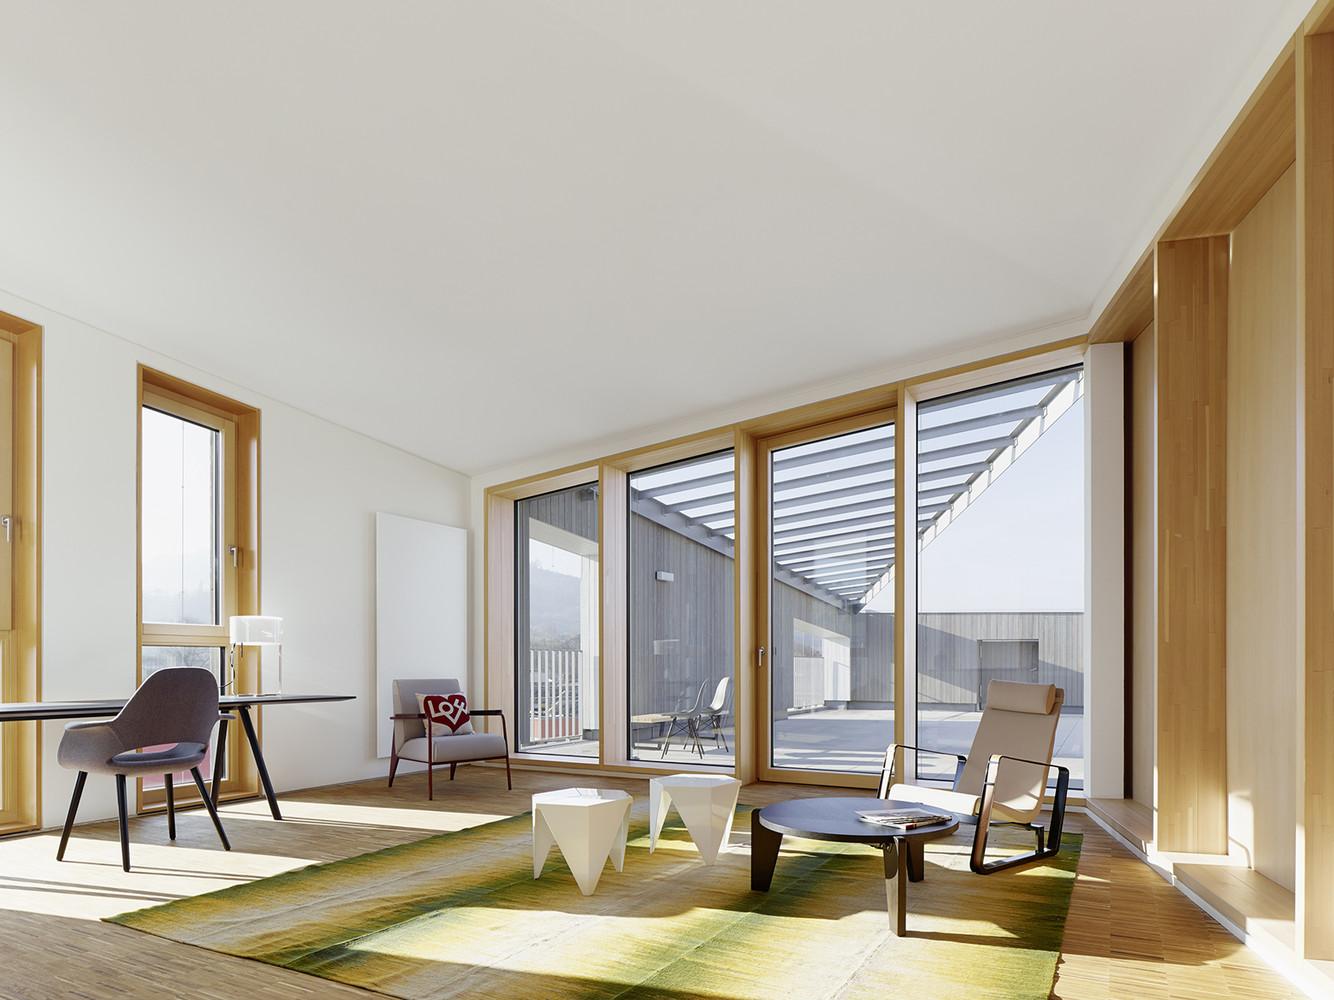 Interior architecture at Hotel Vauban. Photography by Zooey Braun